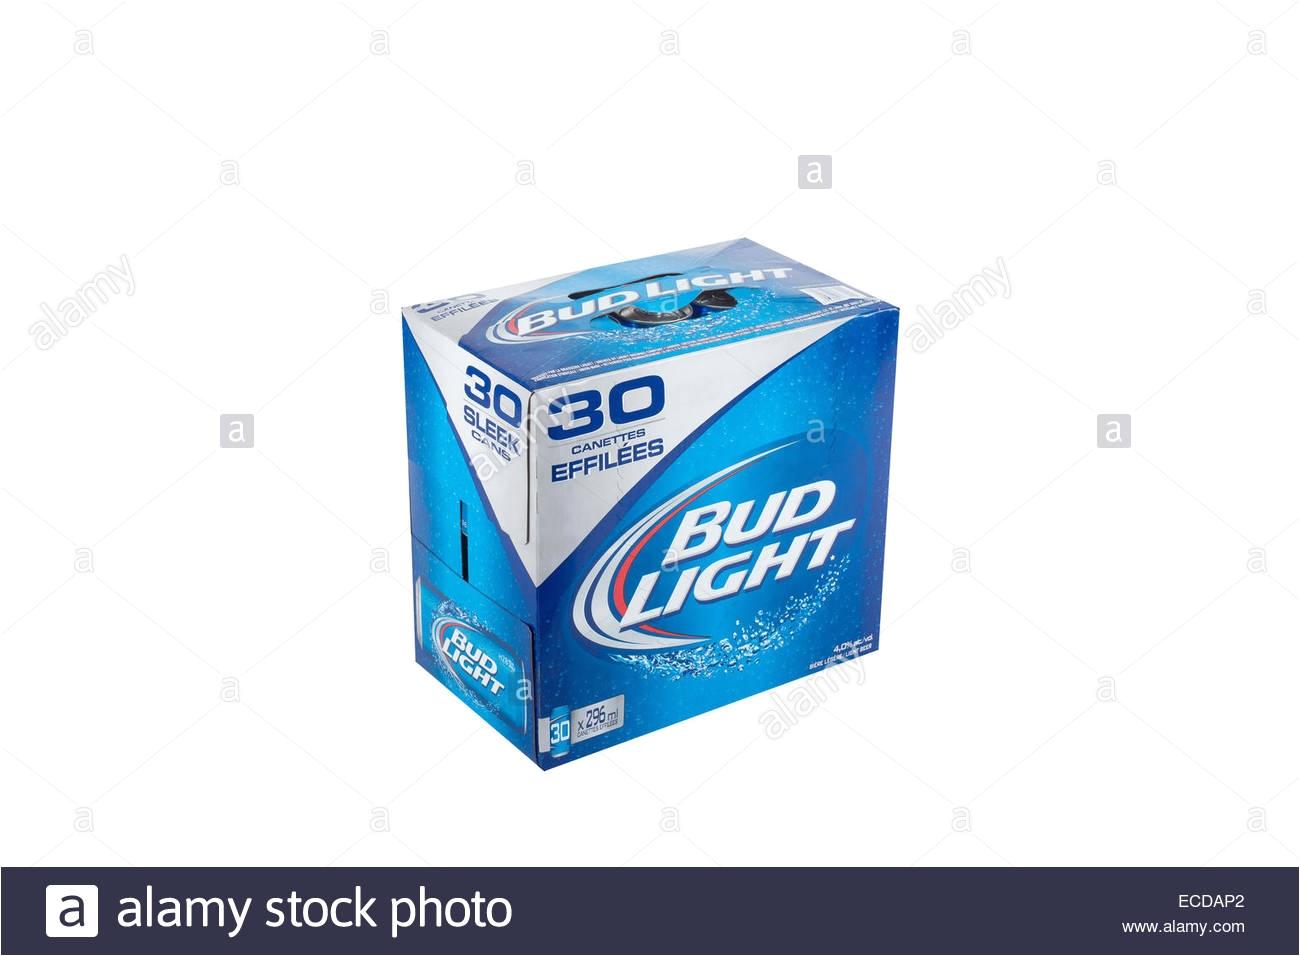 Bud Light 30 Pack Budweiser Beer Can Stock Photos Budweiser Beer Can Stock Images